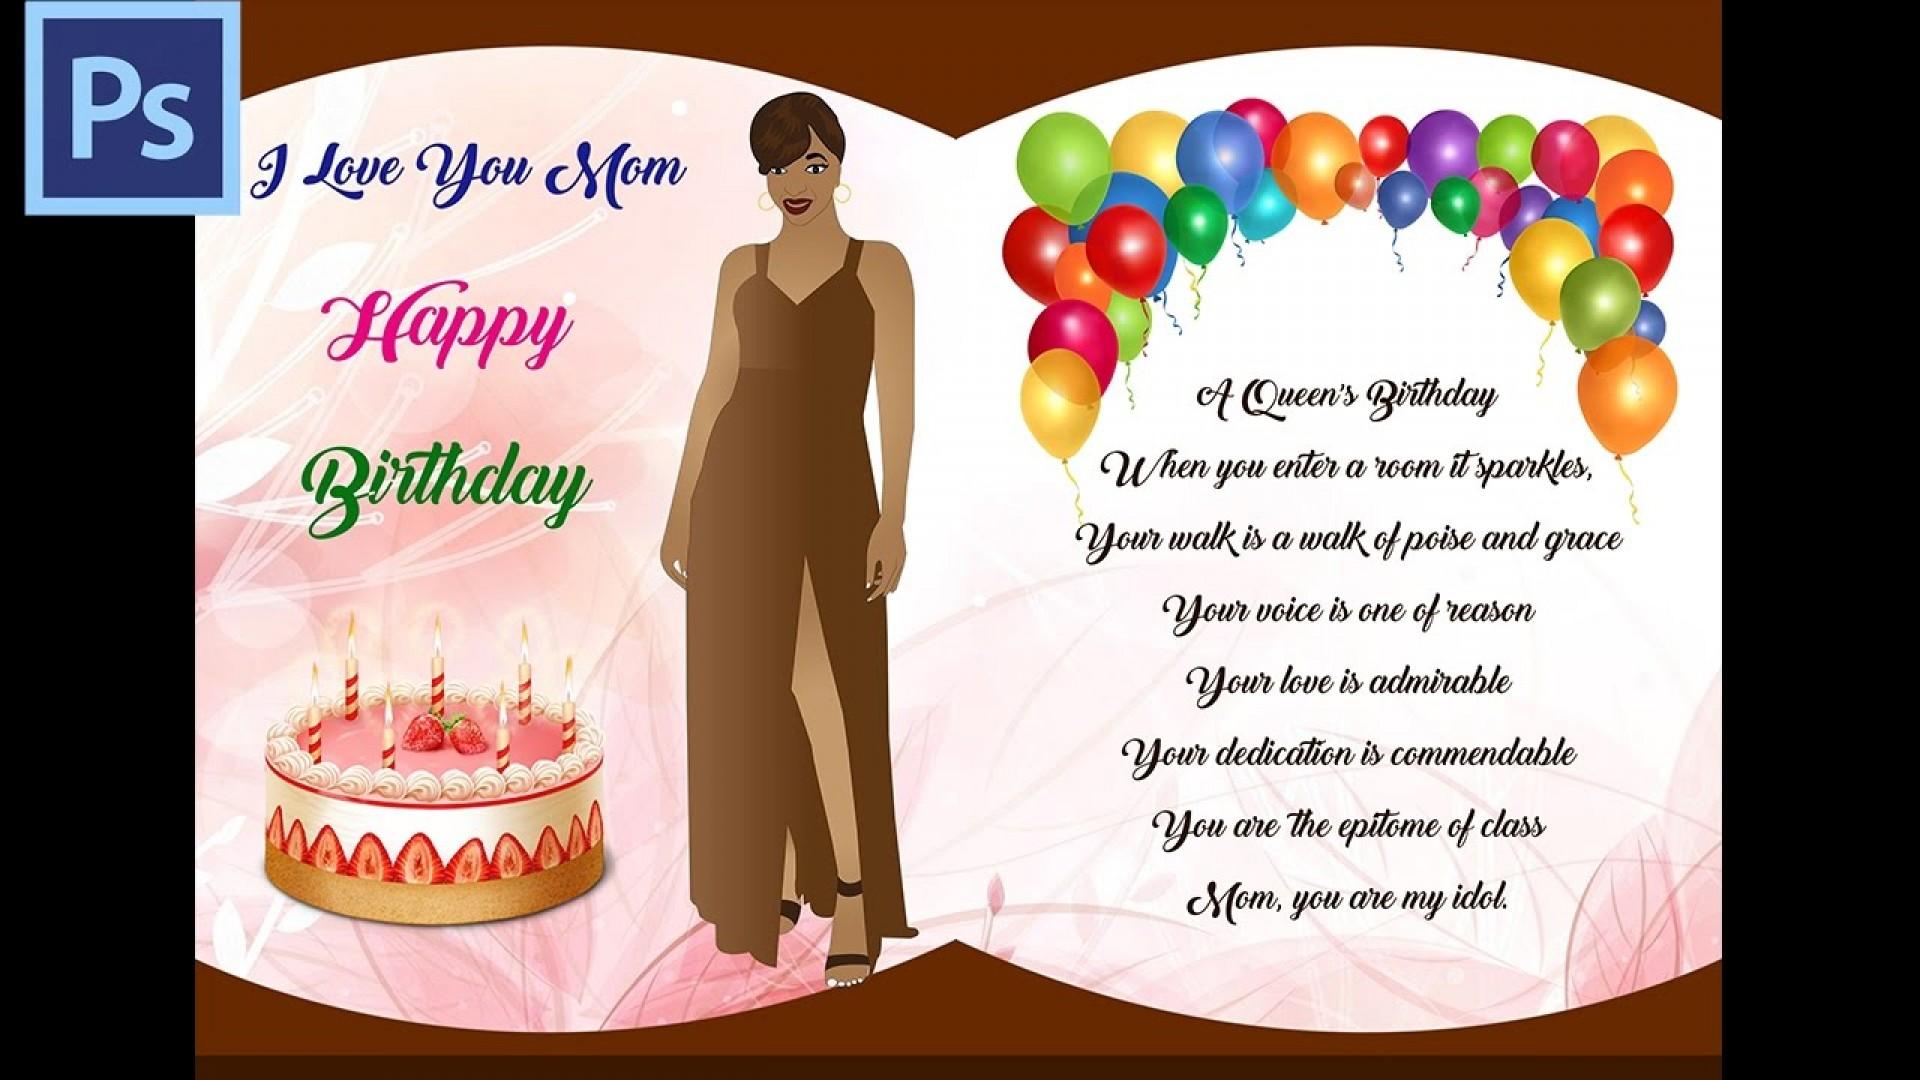 010 Wonderful Birthday Card Template Photoshop Image  Greeting Format 4x6 Free1920